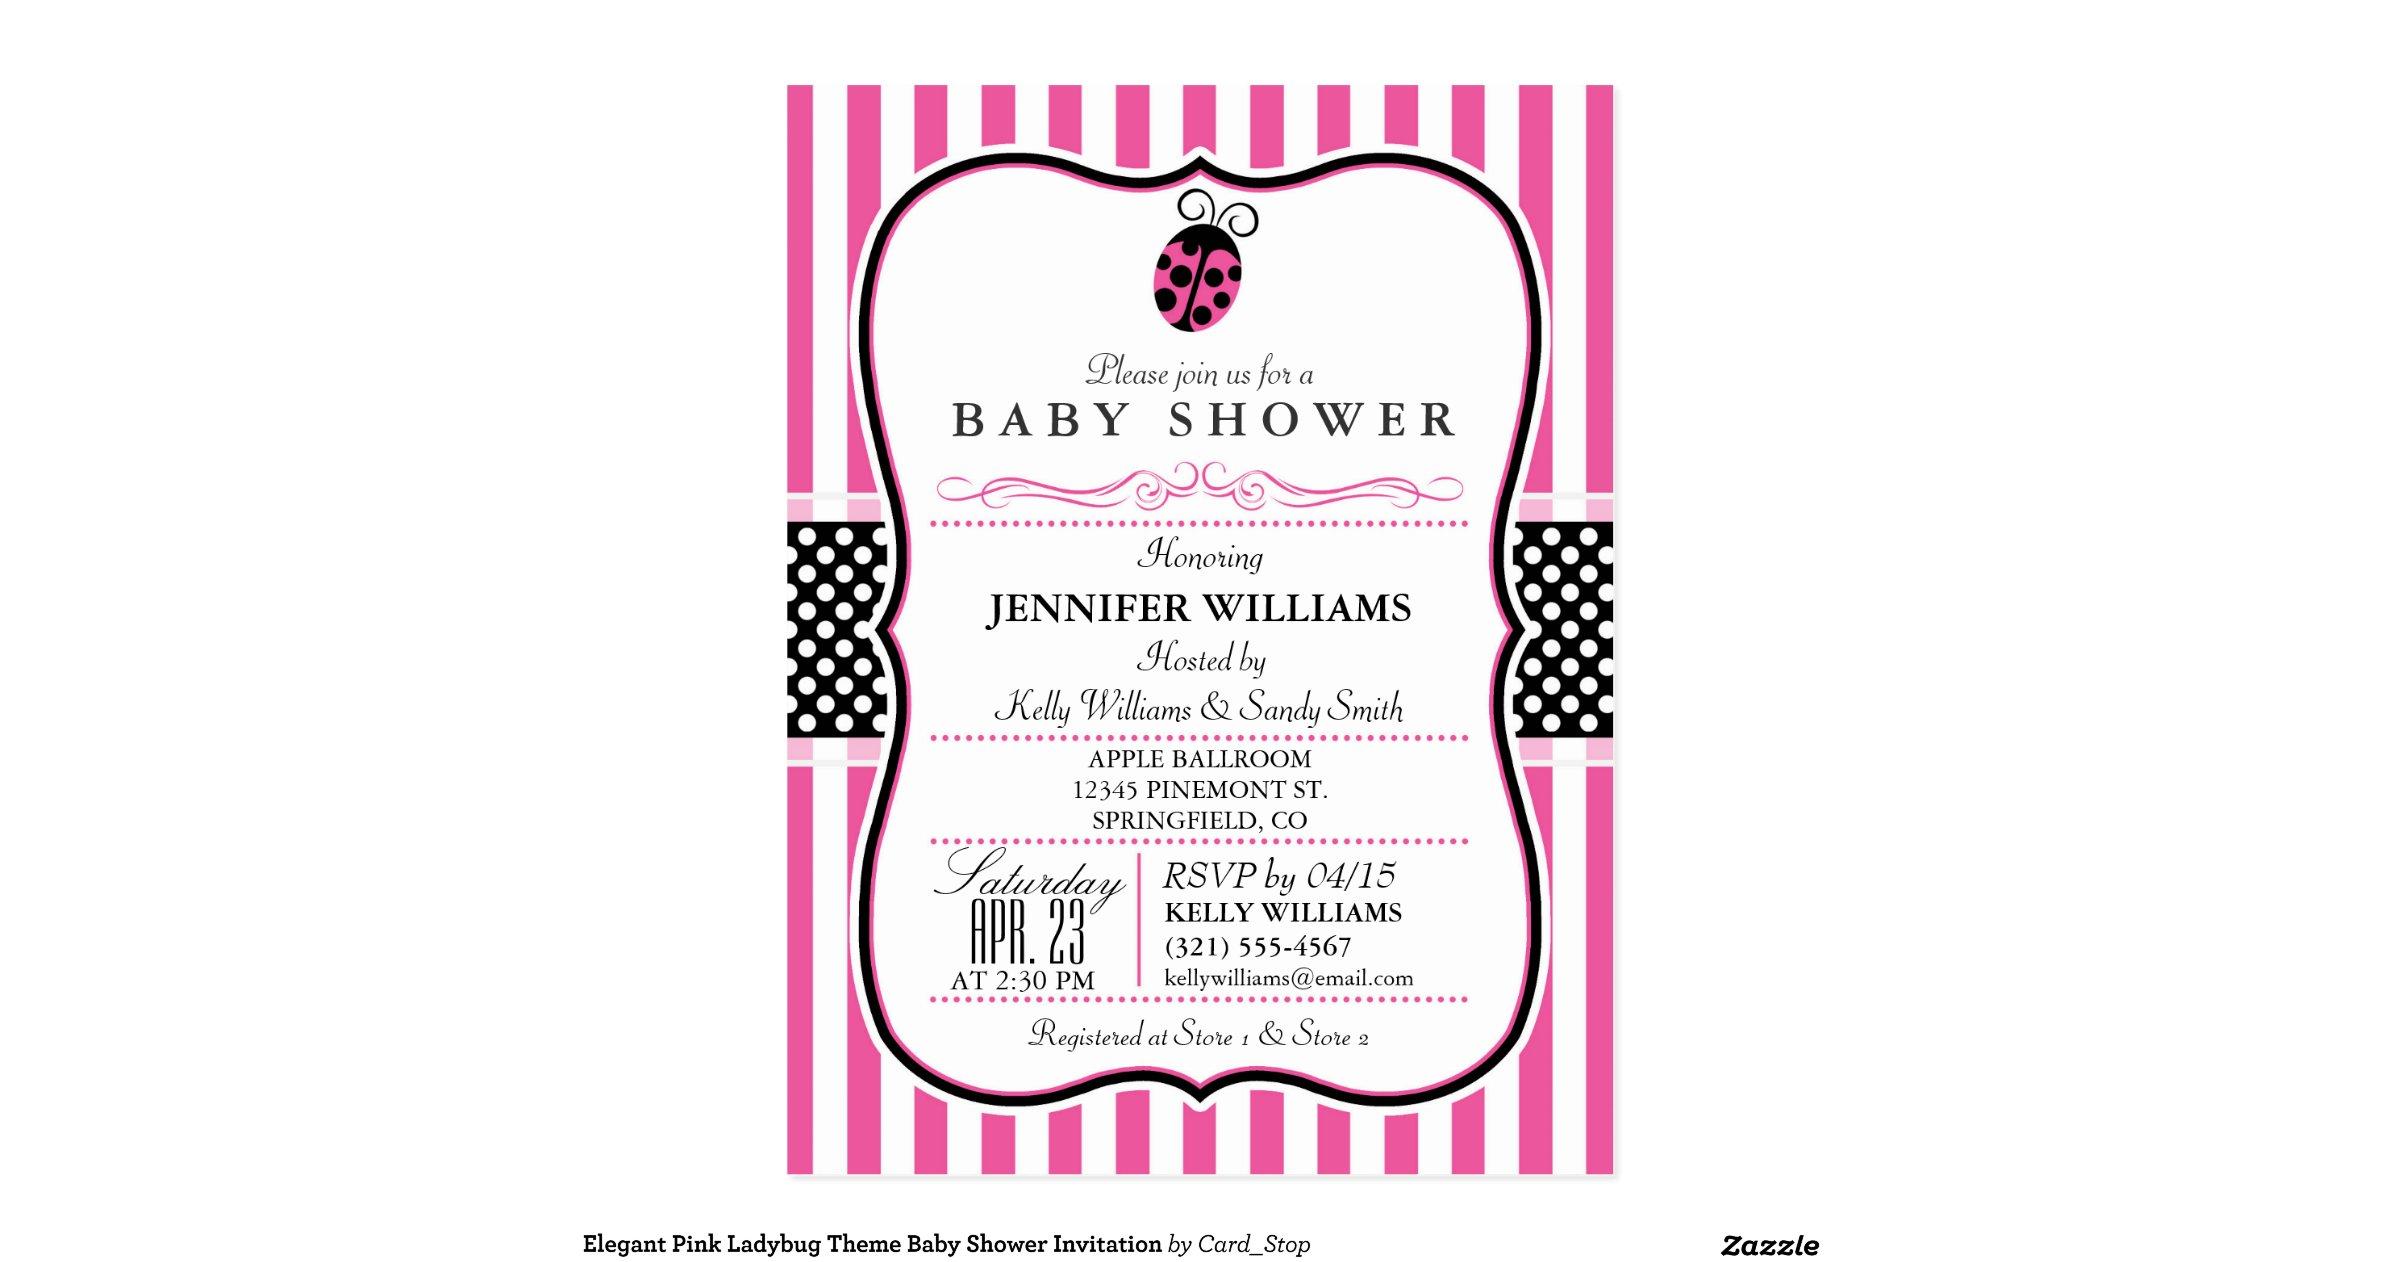 elegant pink ladybug theme baby shower invitation postcard